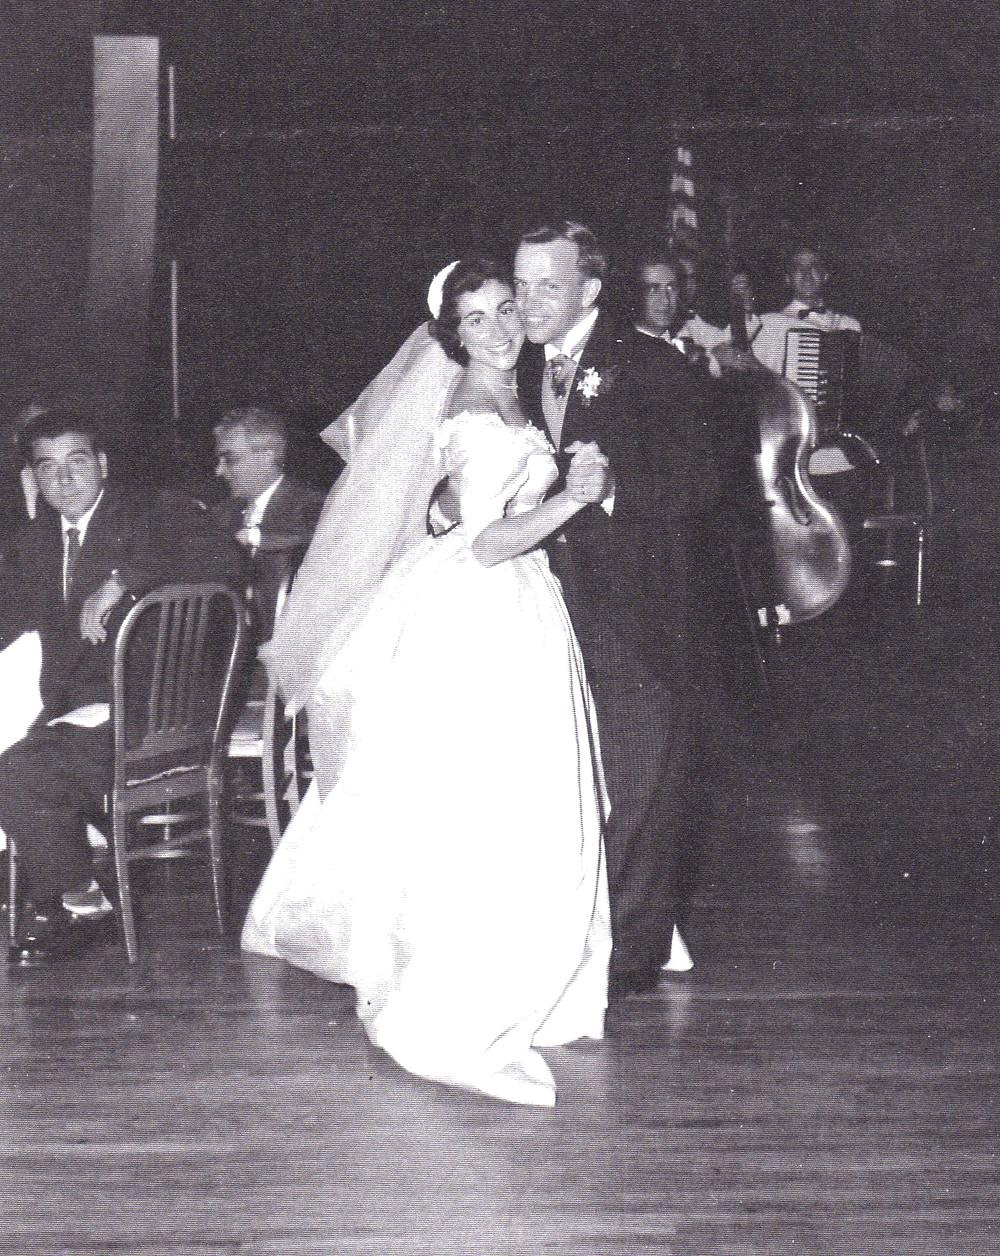 Norma and Jay - Wedding 1954.jpg